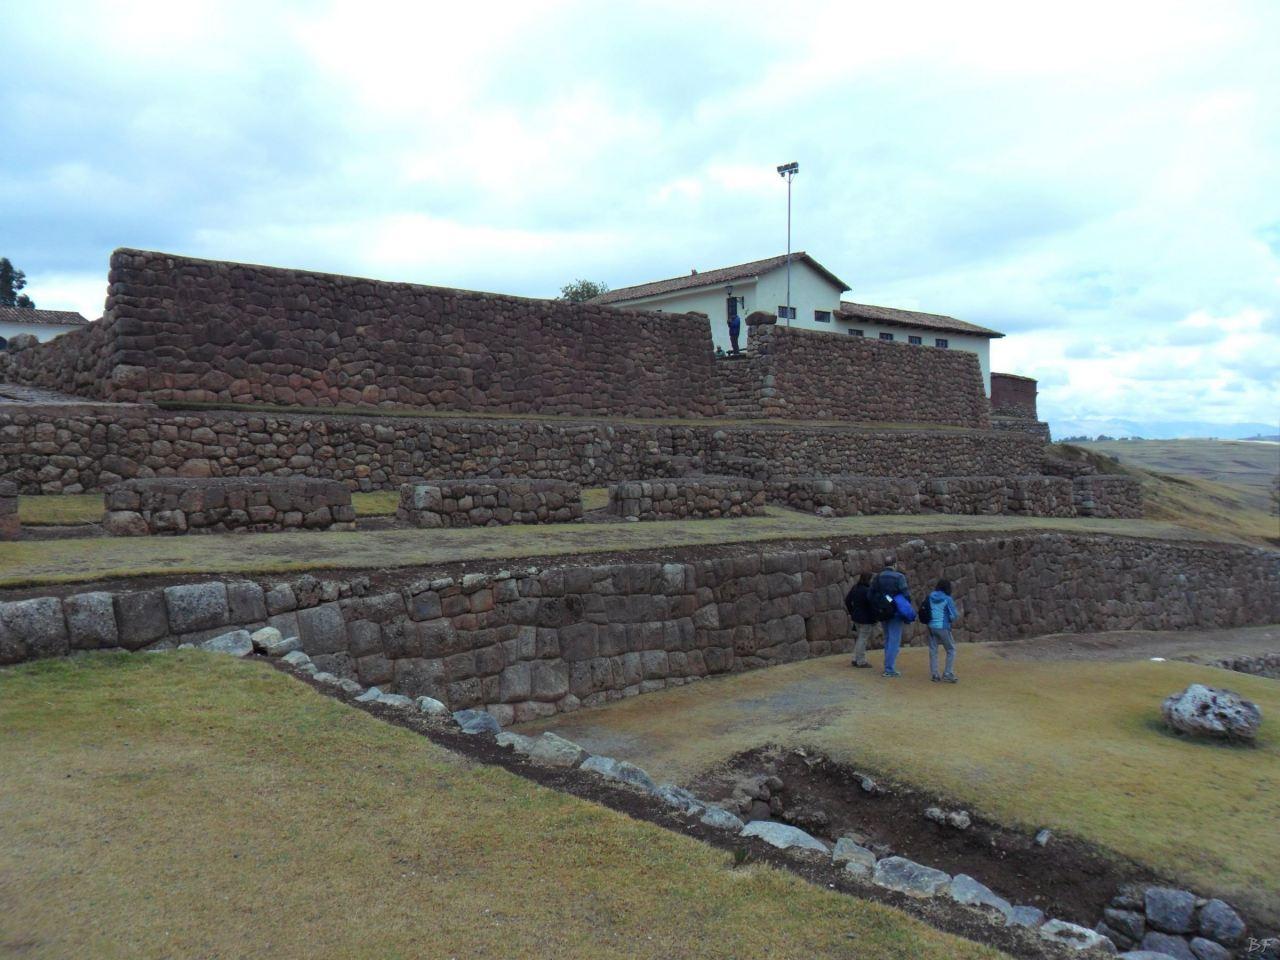 Chinchero-Mura-Poligonali-Piramide-Urubamba-Peru-28